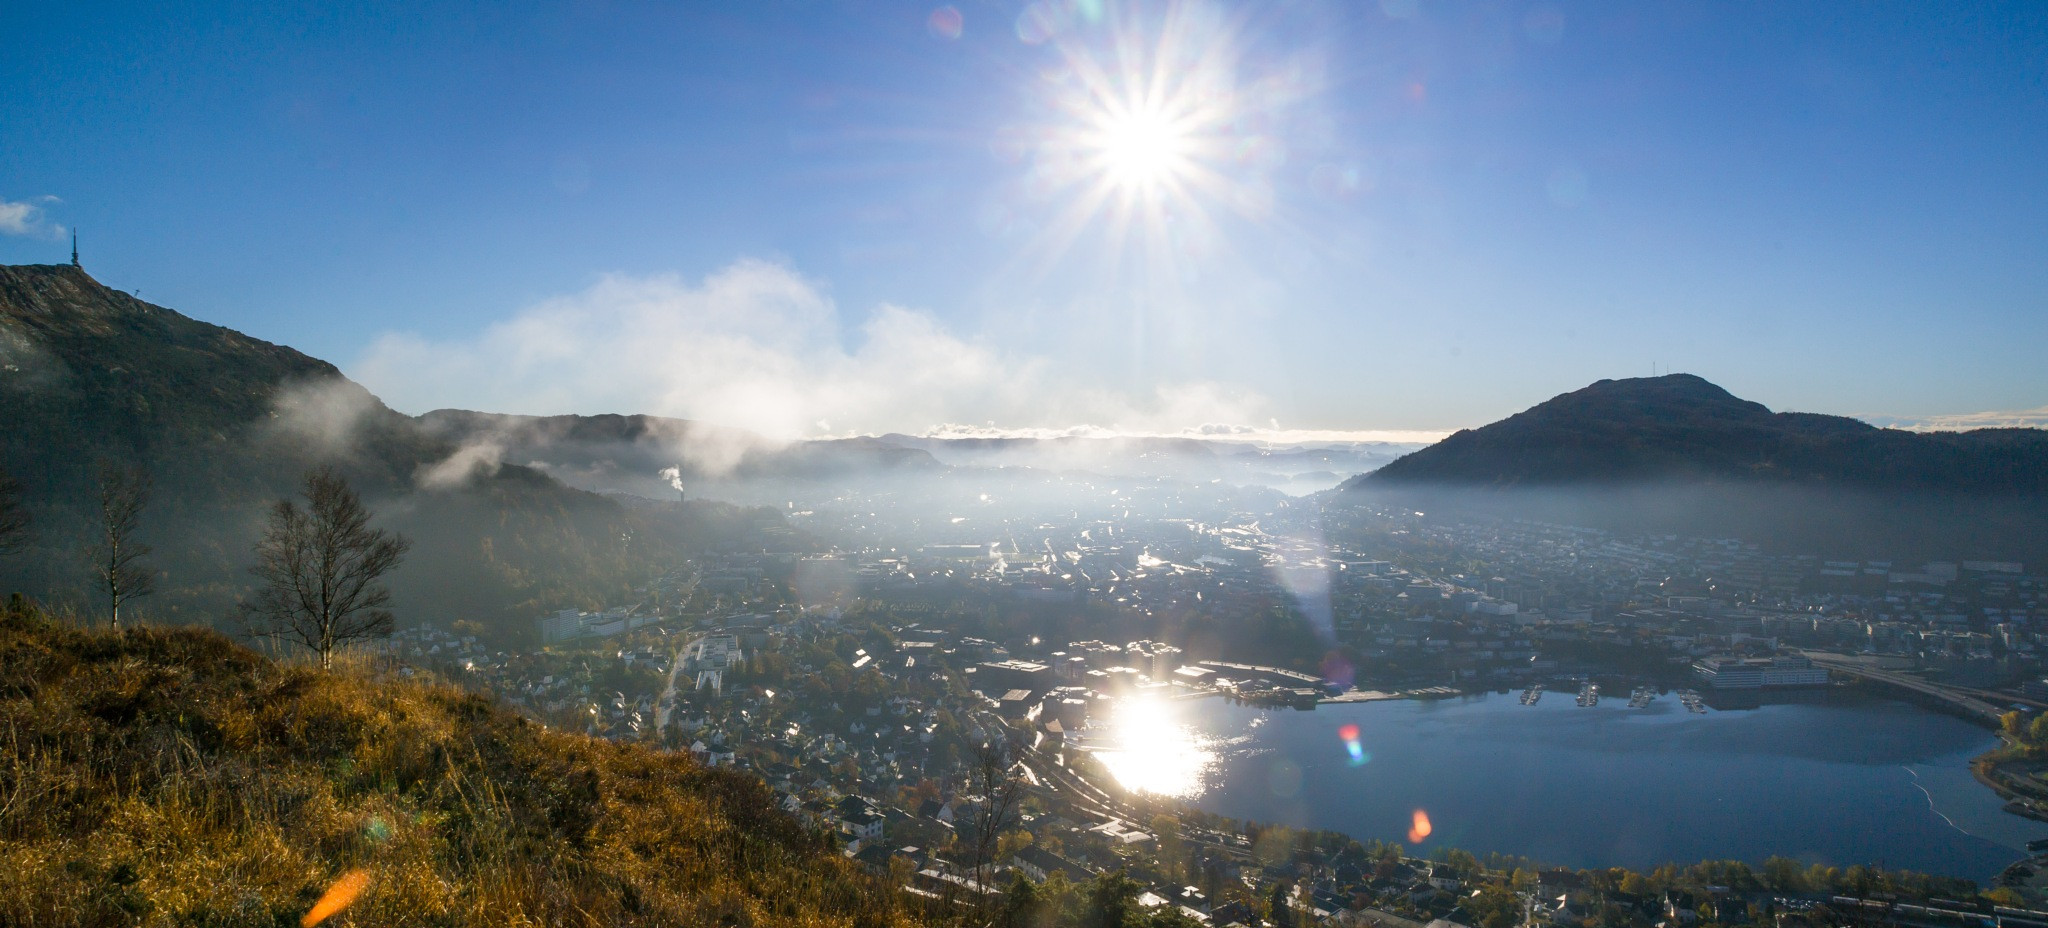 Haze Over Bergen by MjollnirMacAlba